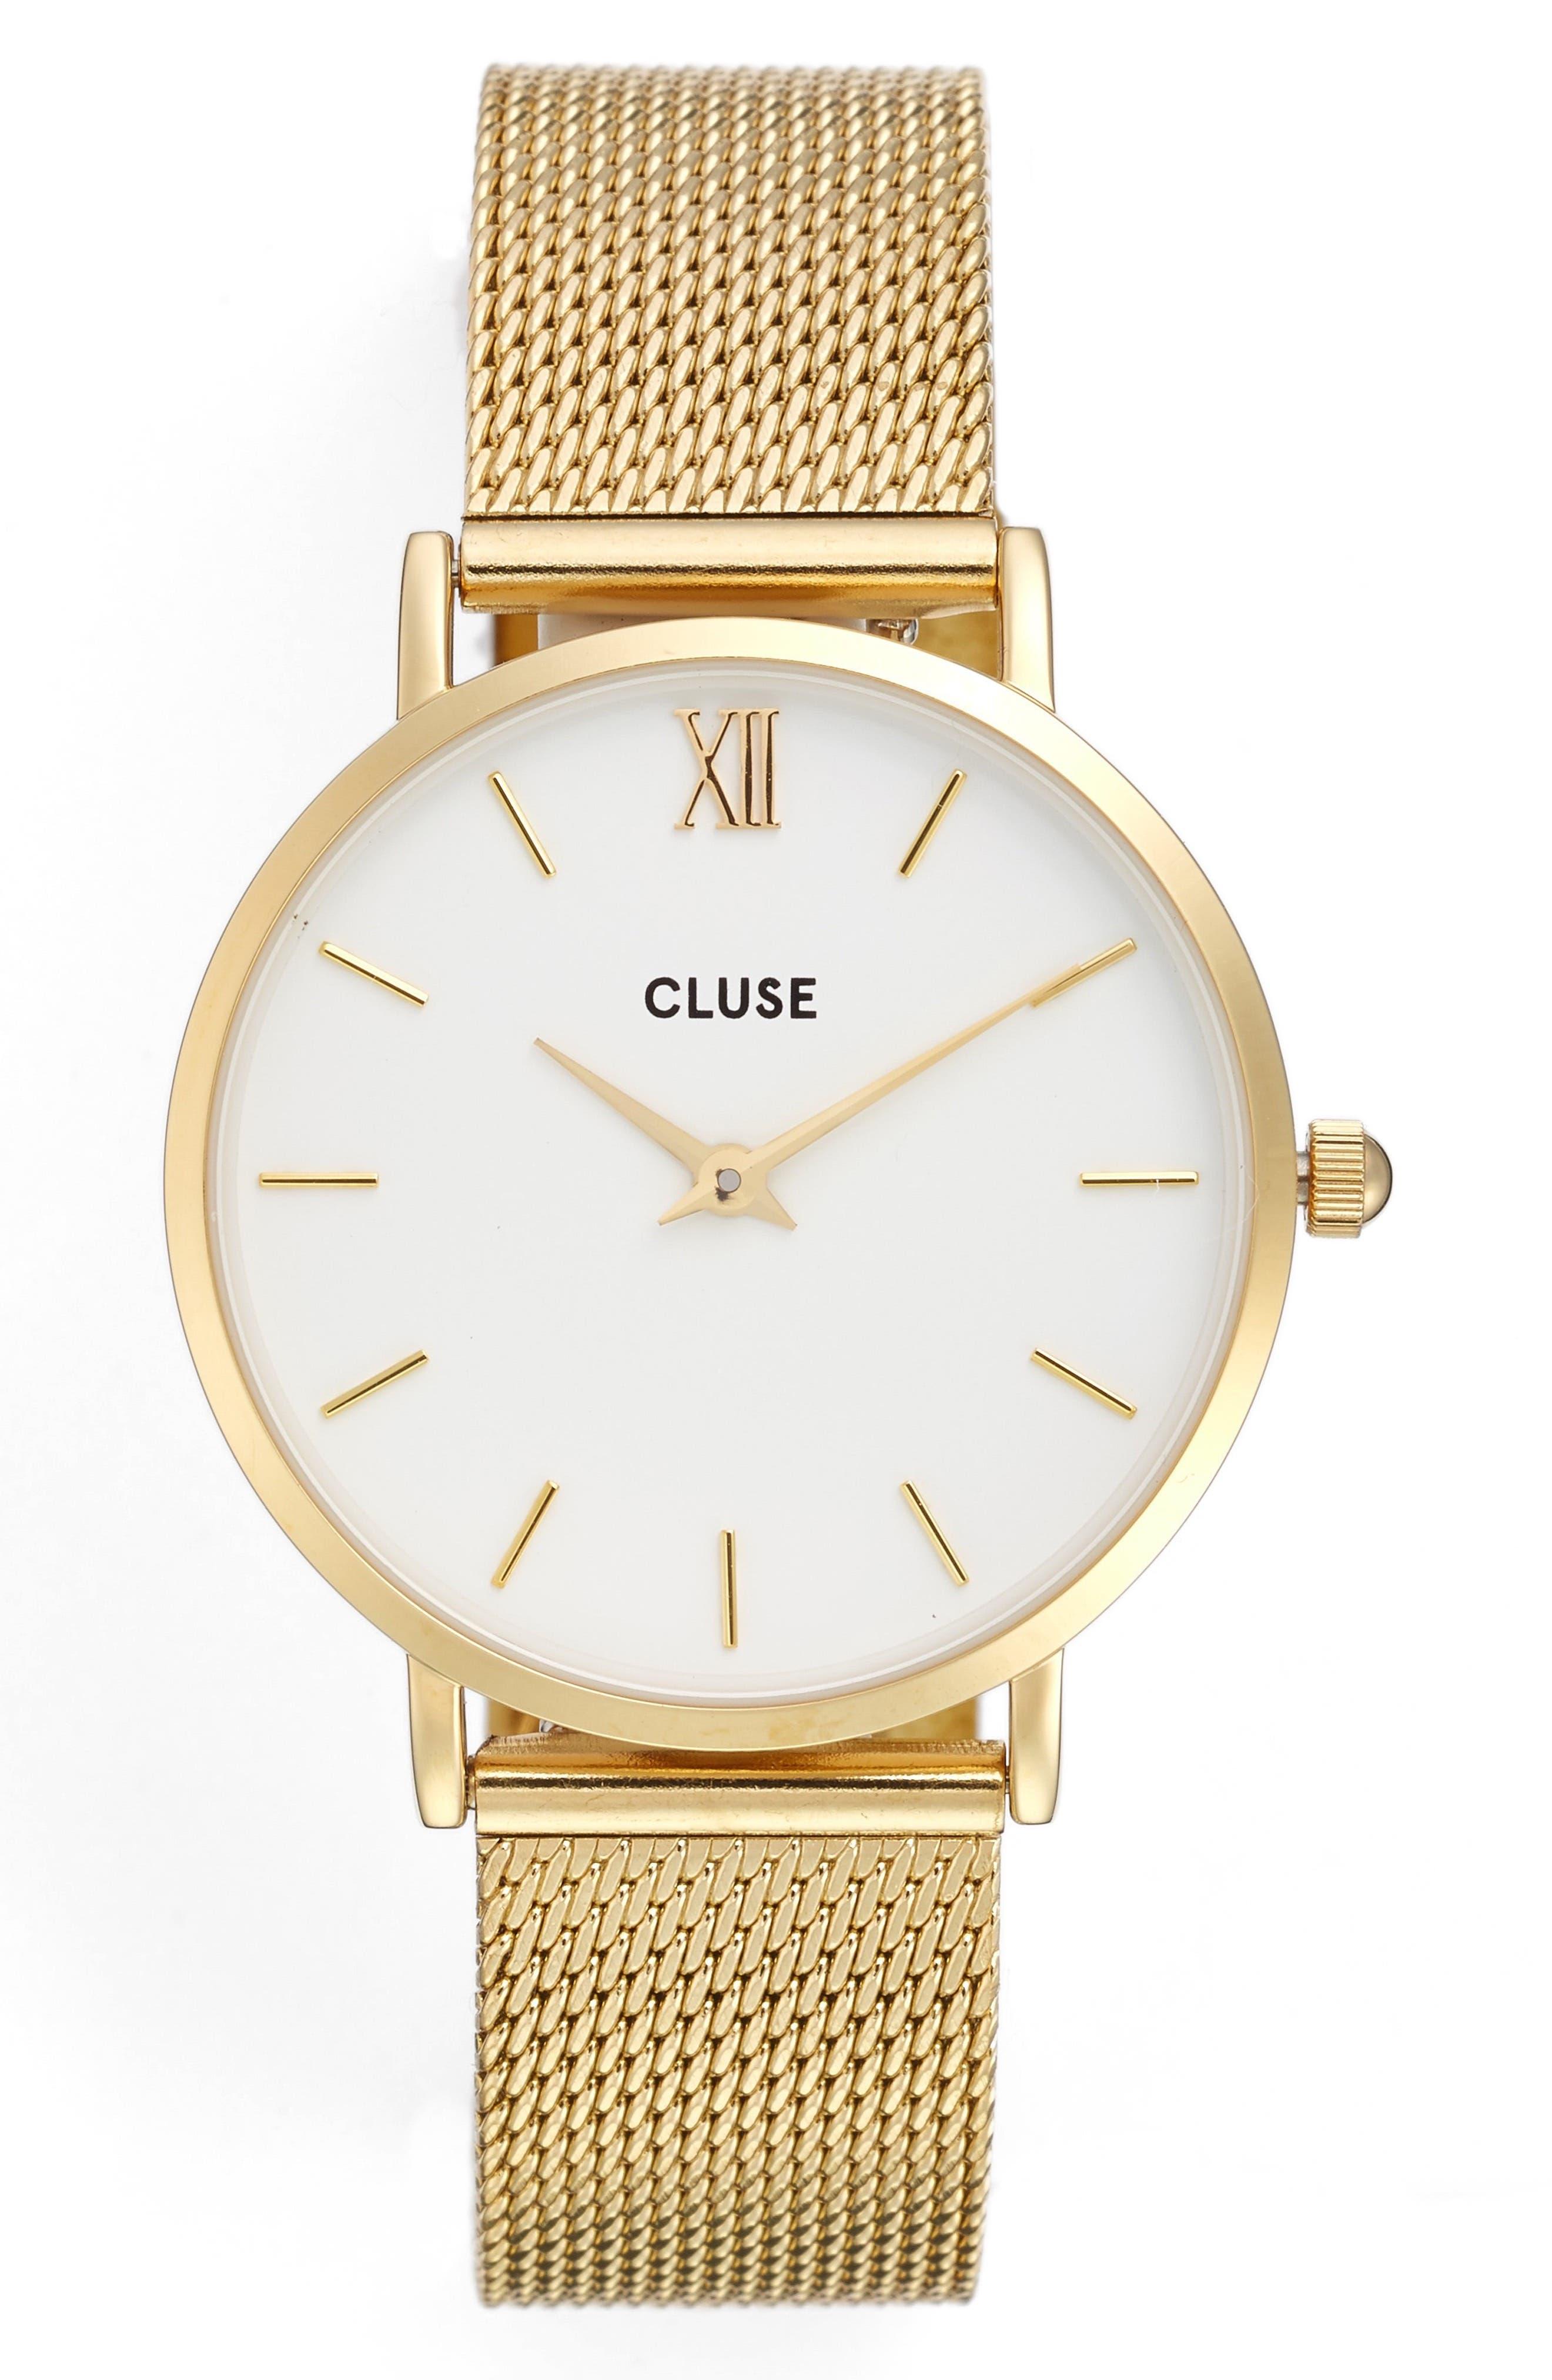 Main Image - CLUSE Minuit Mesh Strap Watch, 33mm